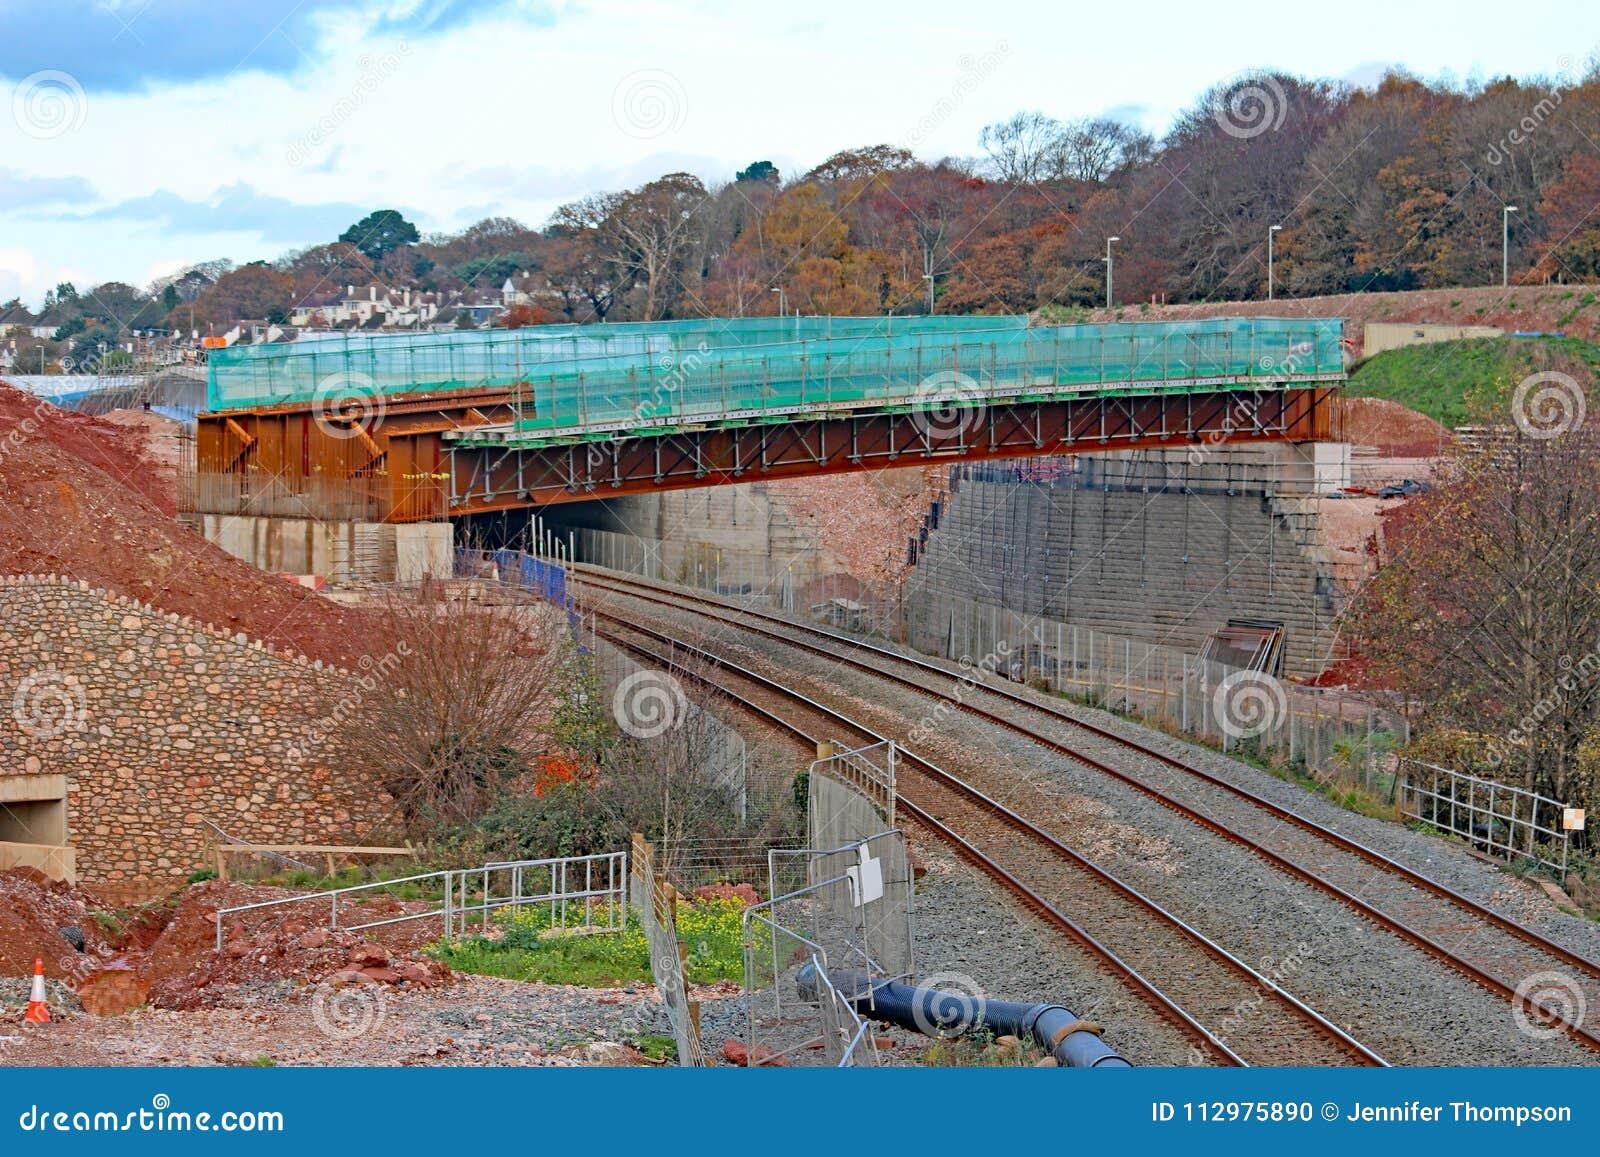 Road bridge under construction